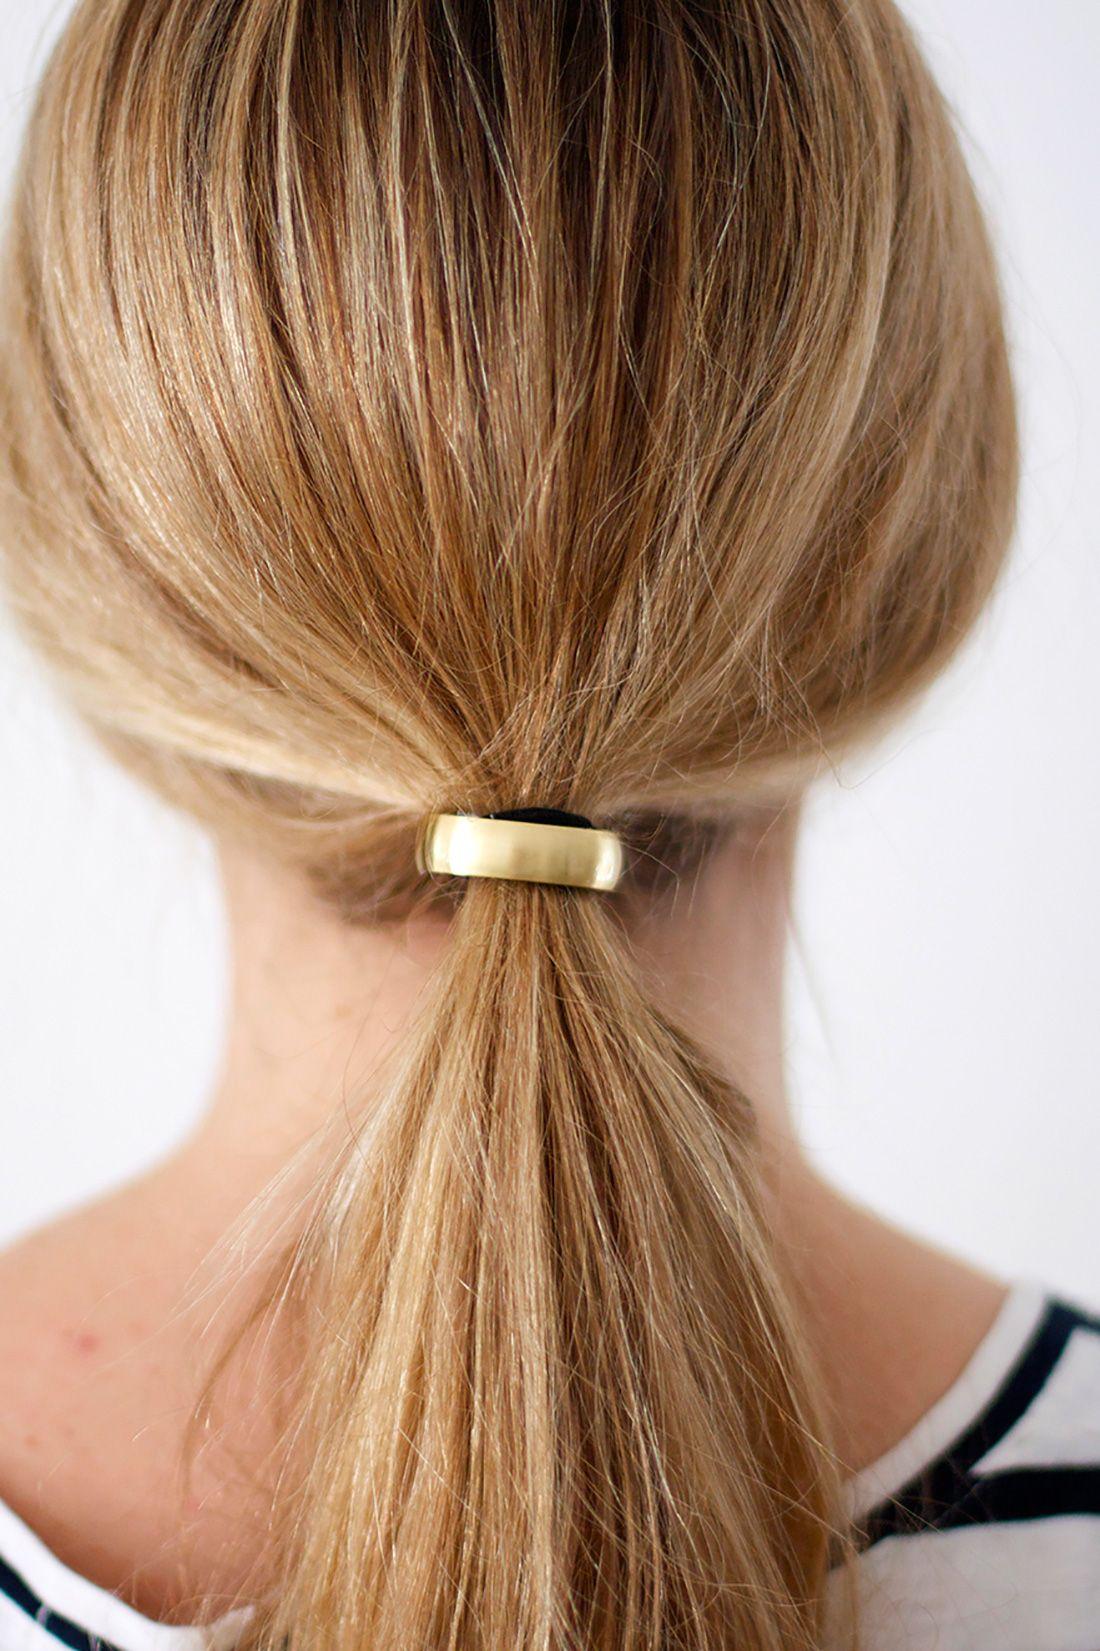 c08db270ae8 Tie One On: 2 Materials, 4 DIY Hair Cuffs via Brit + Co.   craft ...